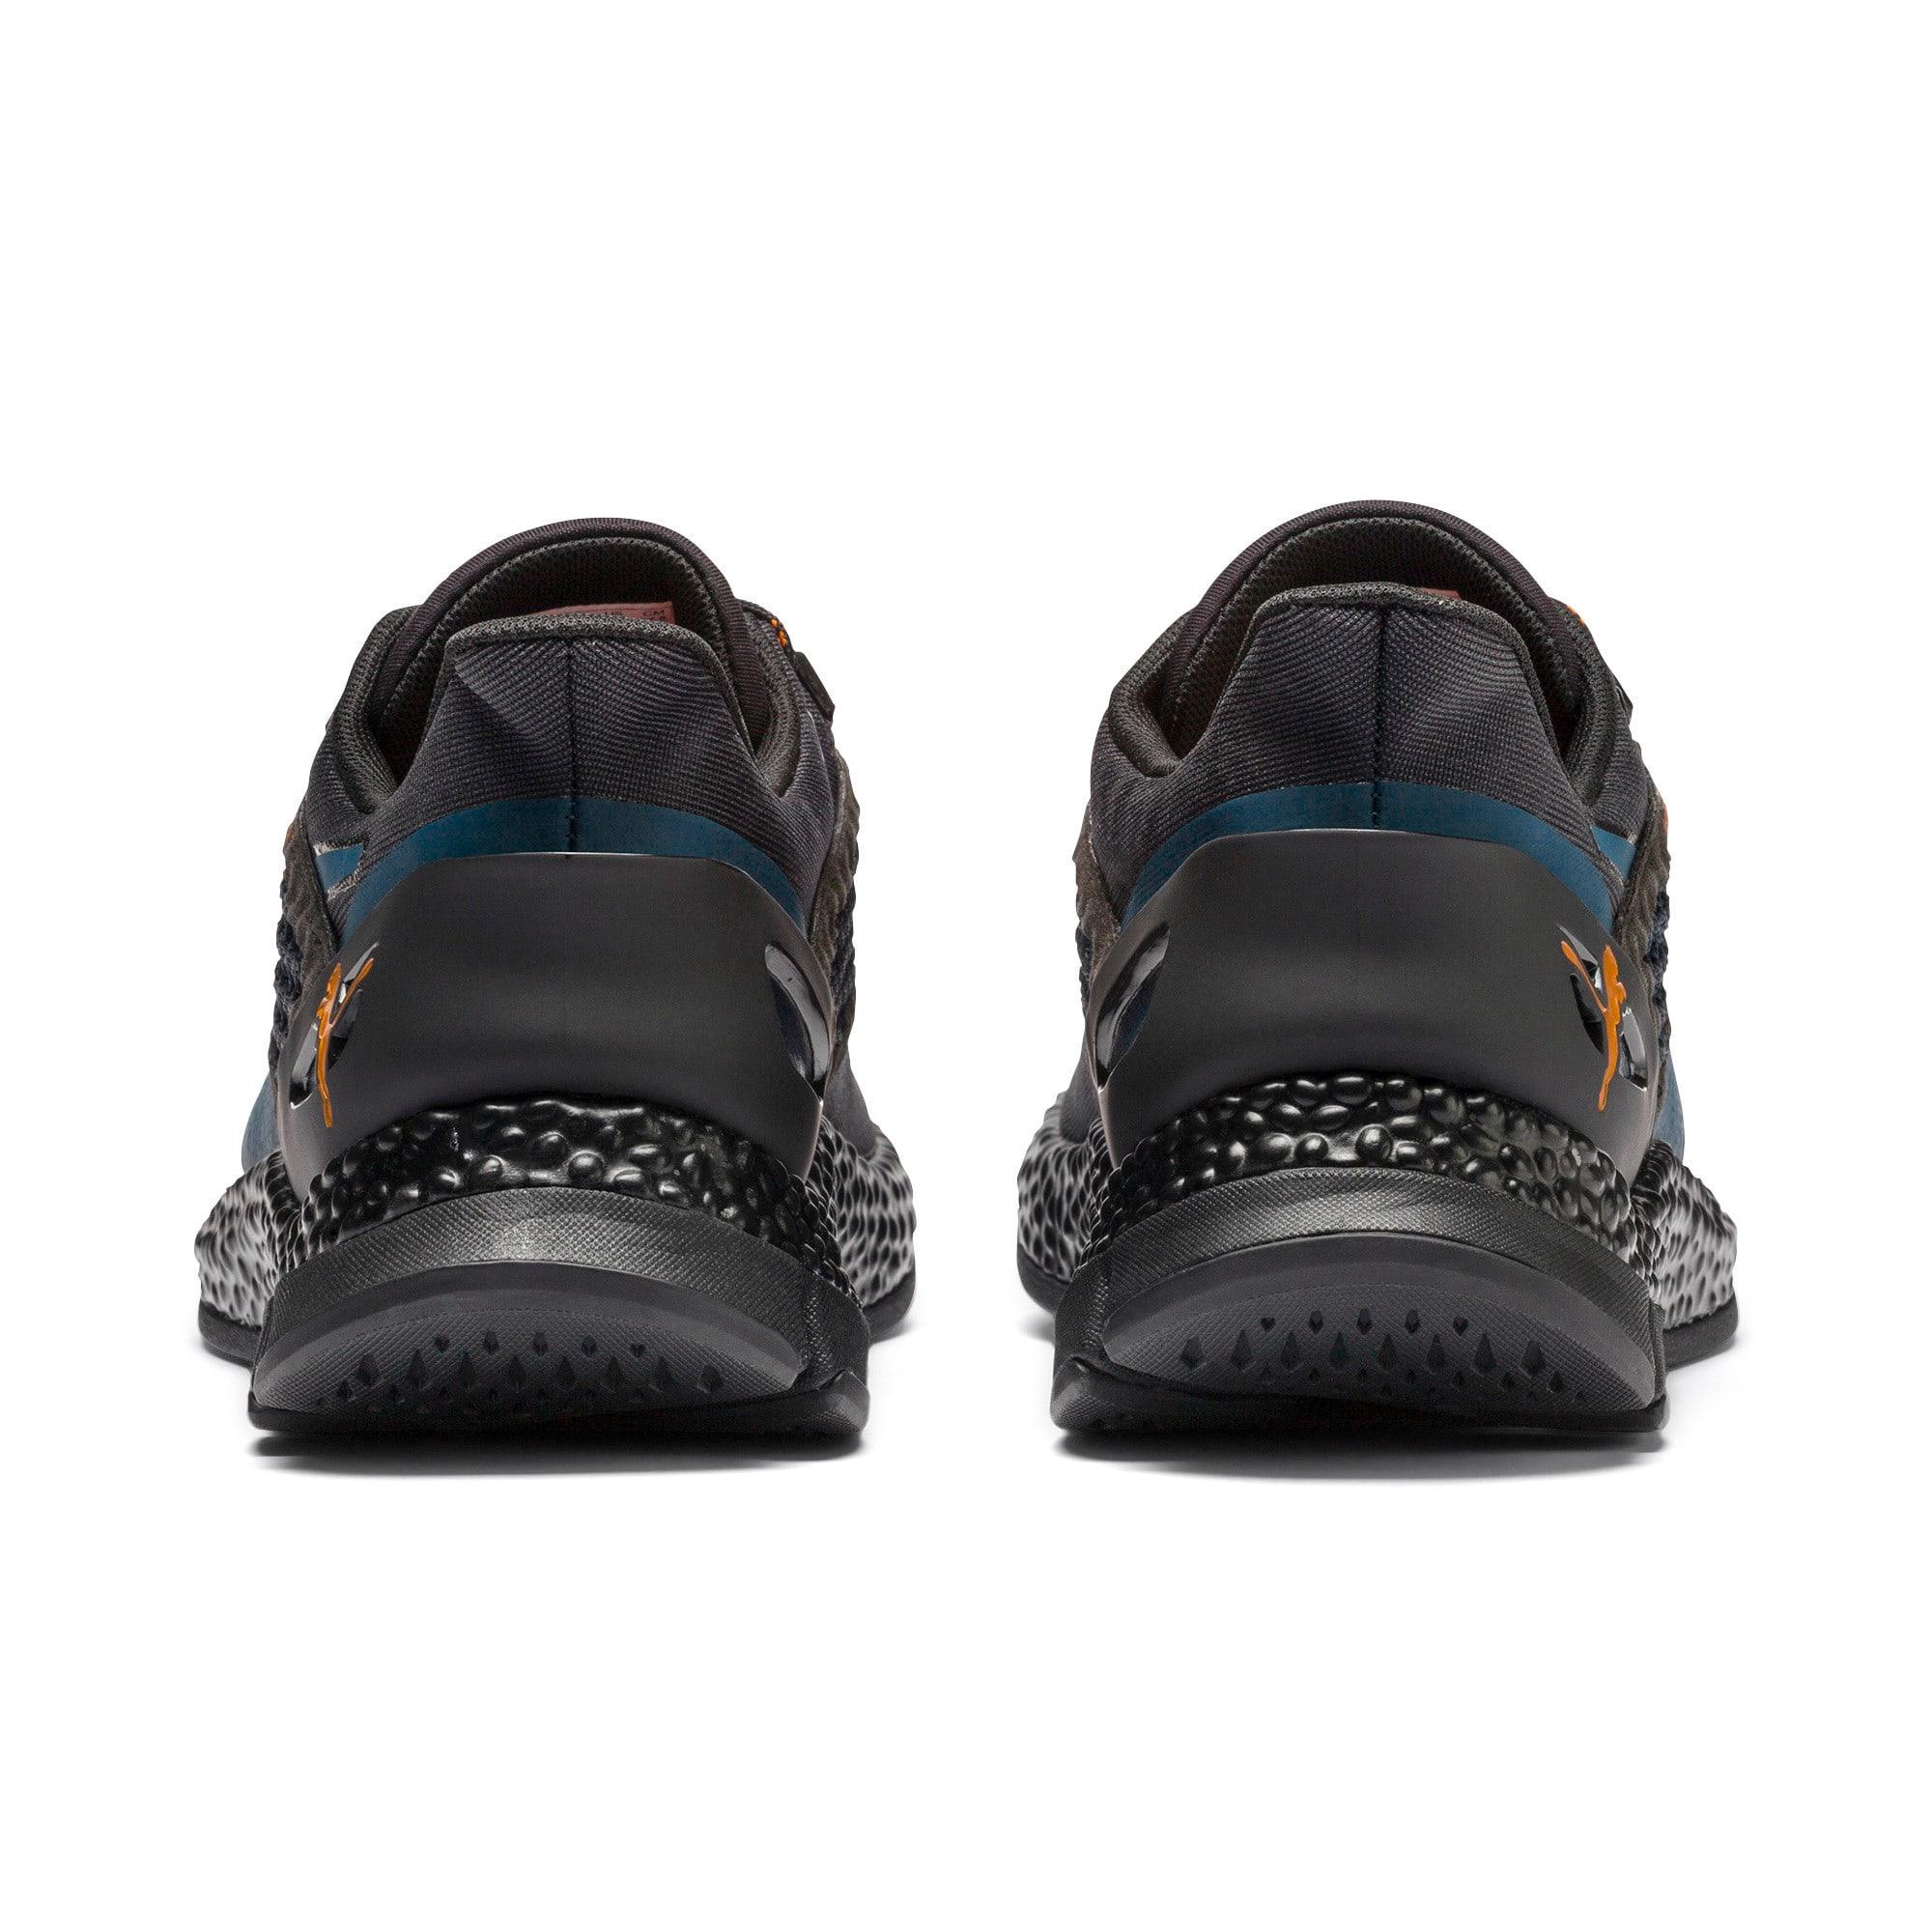 Imagen en miniatura 4 de Zapatillas de running de hombre HYBRID NETFIT Astro, Gibraltar Sea-Puma Black, mediana